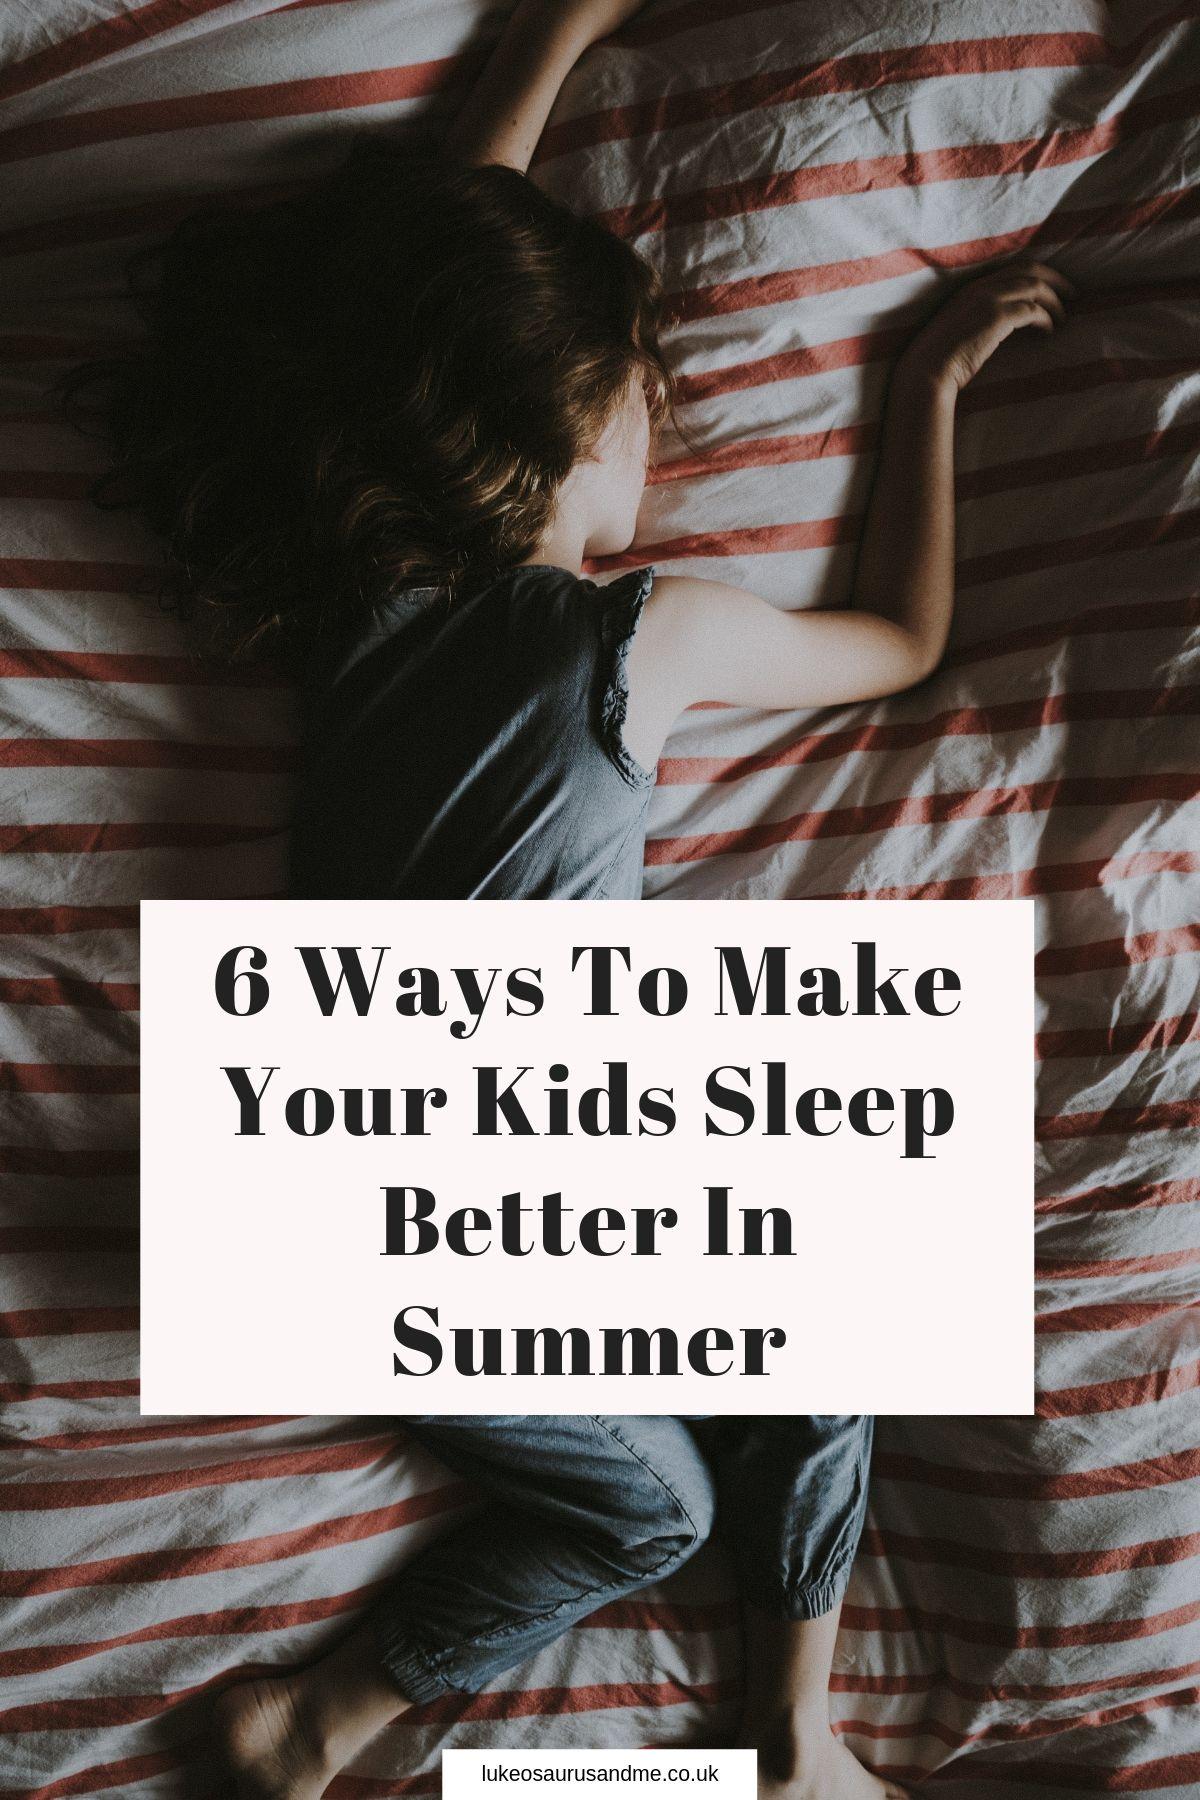 6 Ways To Help Your Kids Sleep Better In Summer at https://lukeosaurusandme.co.uk